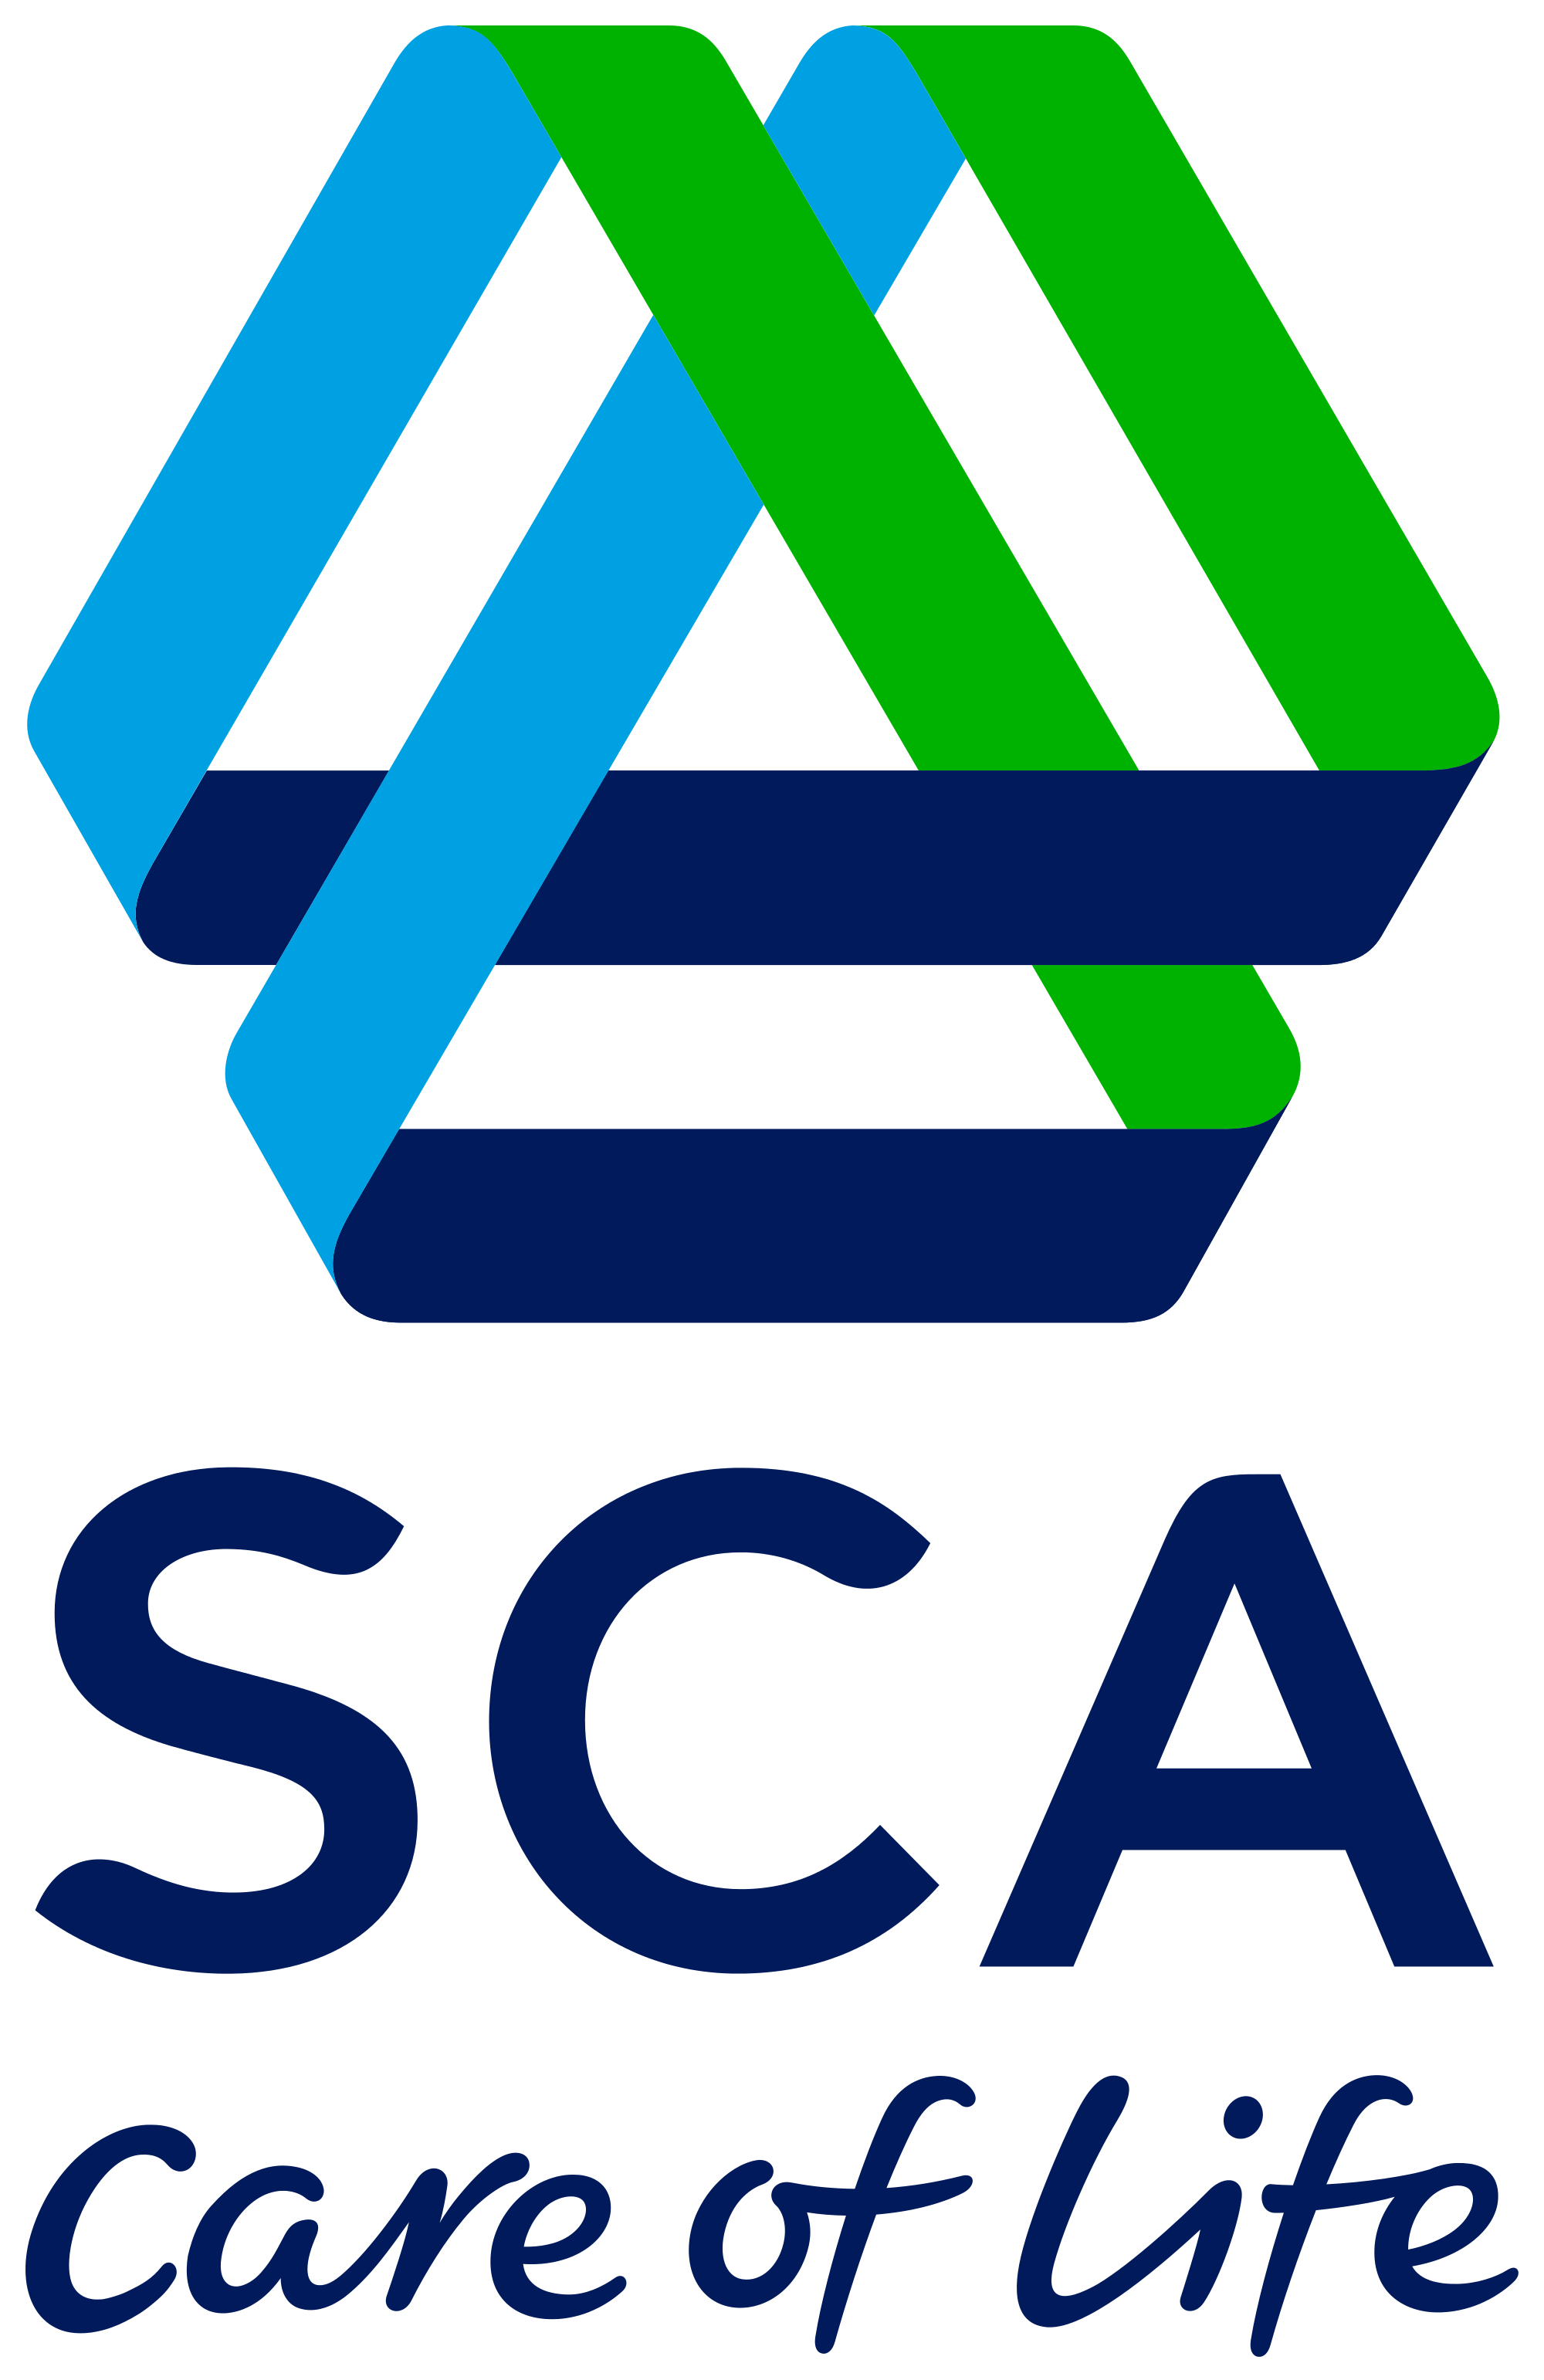 t2s-sca-logo